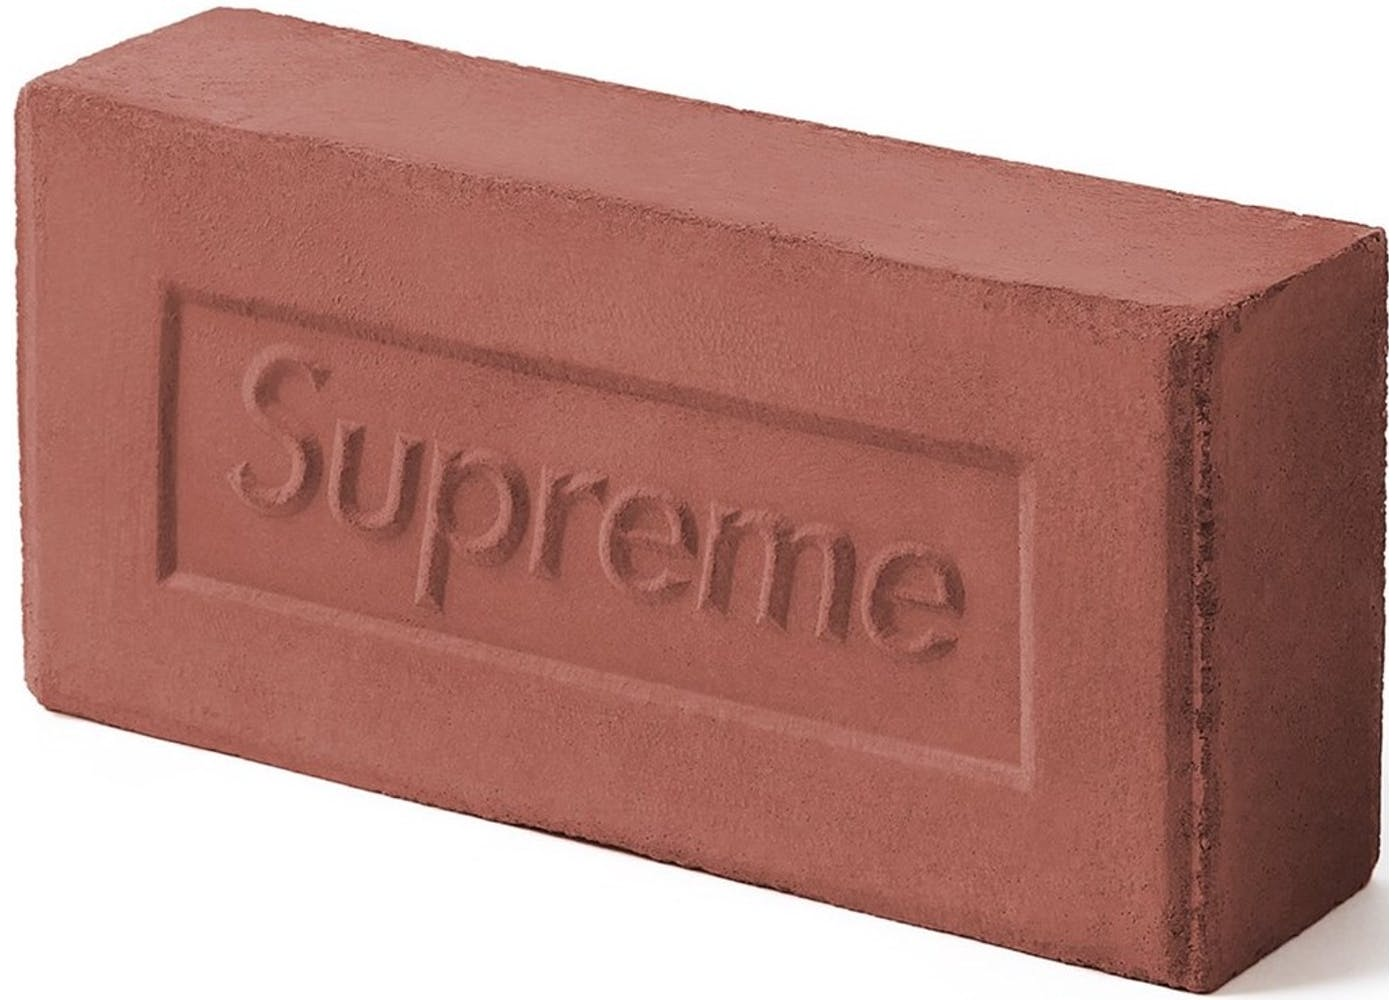 Supreme Clay Brick - StockX News